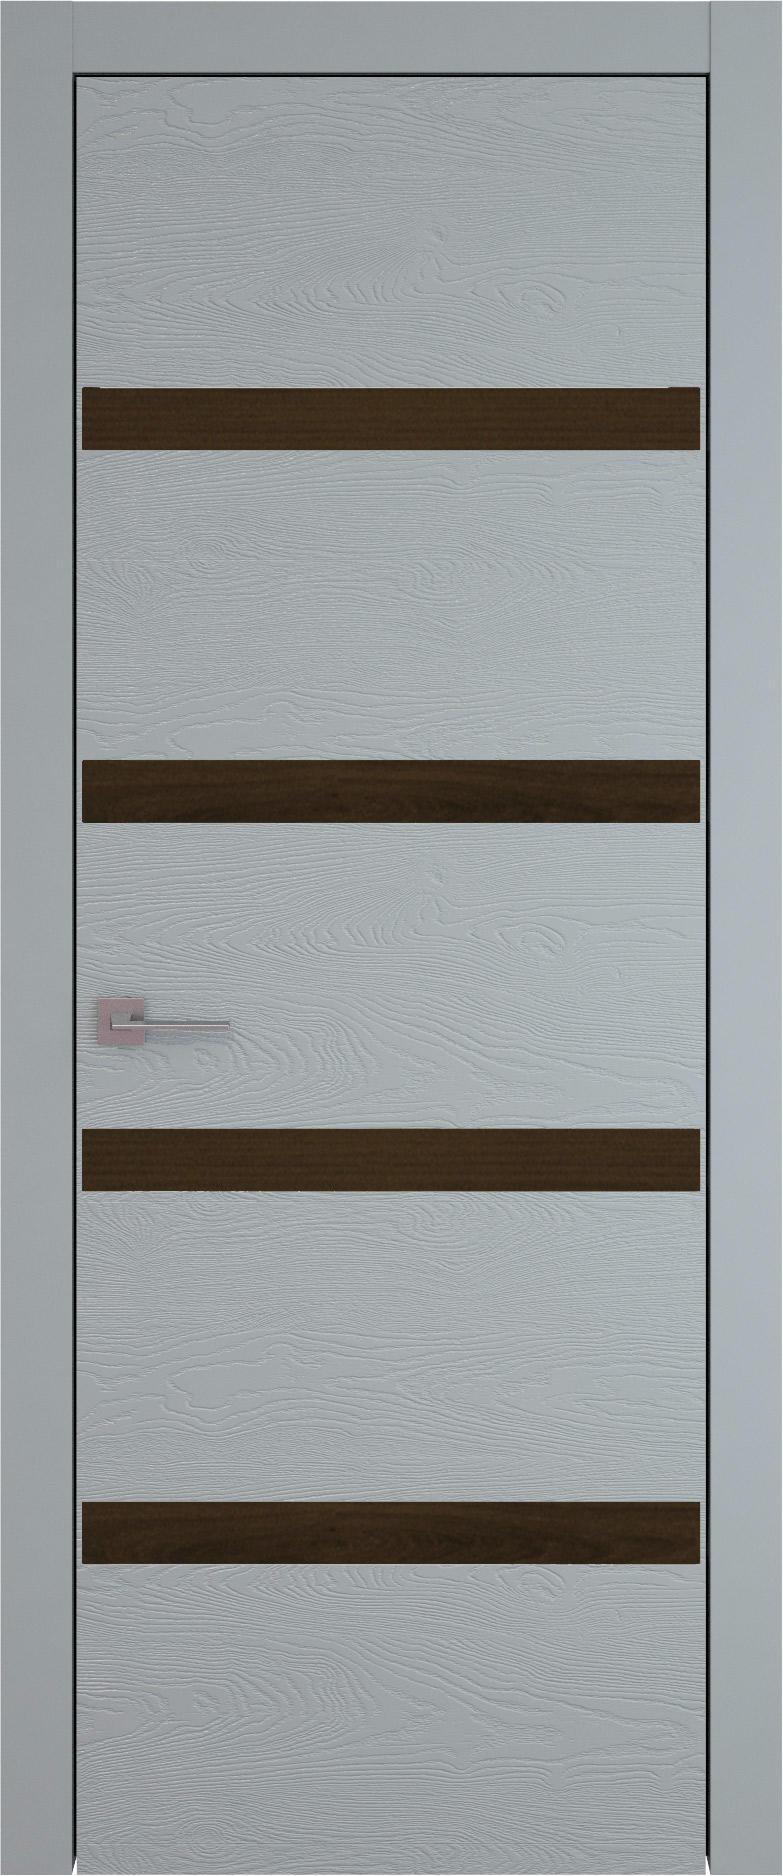 Tivoli Д-4 цвет - Серебристо-серая эмаль по шпону (RAL 7045) Без стекла (ДГ)